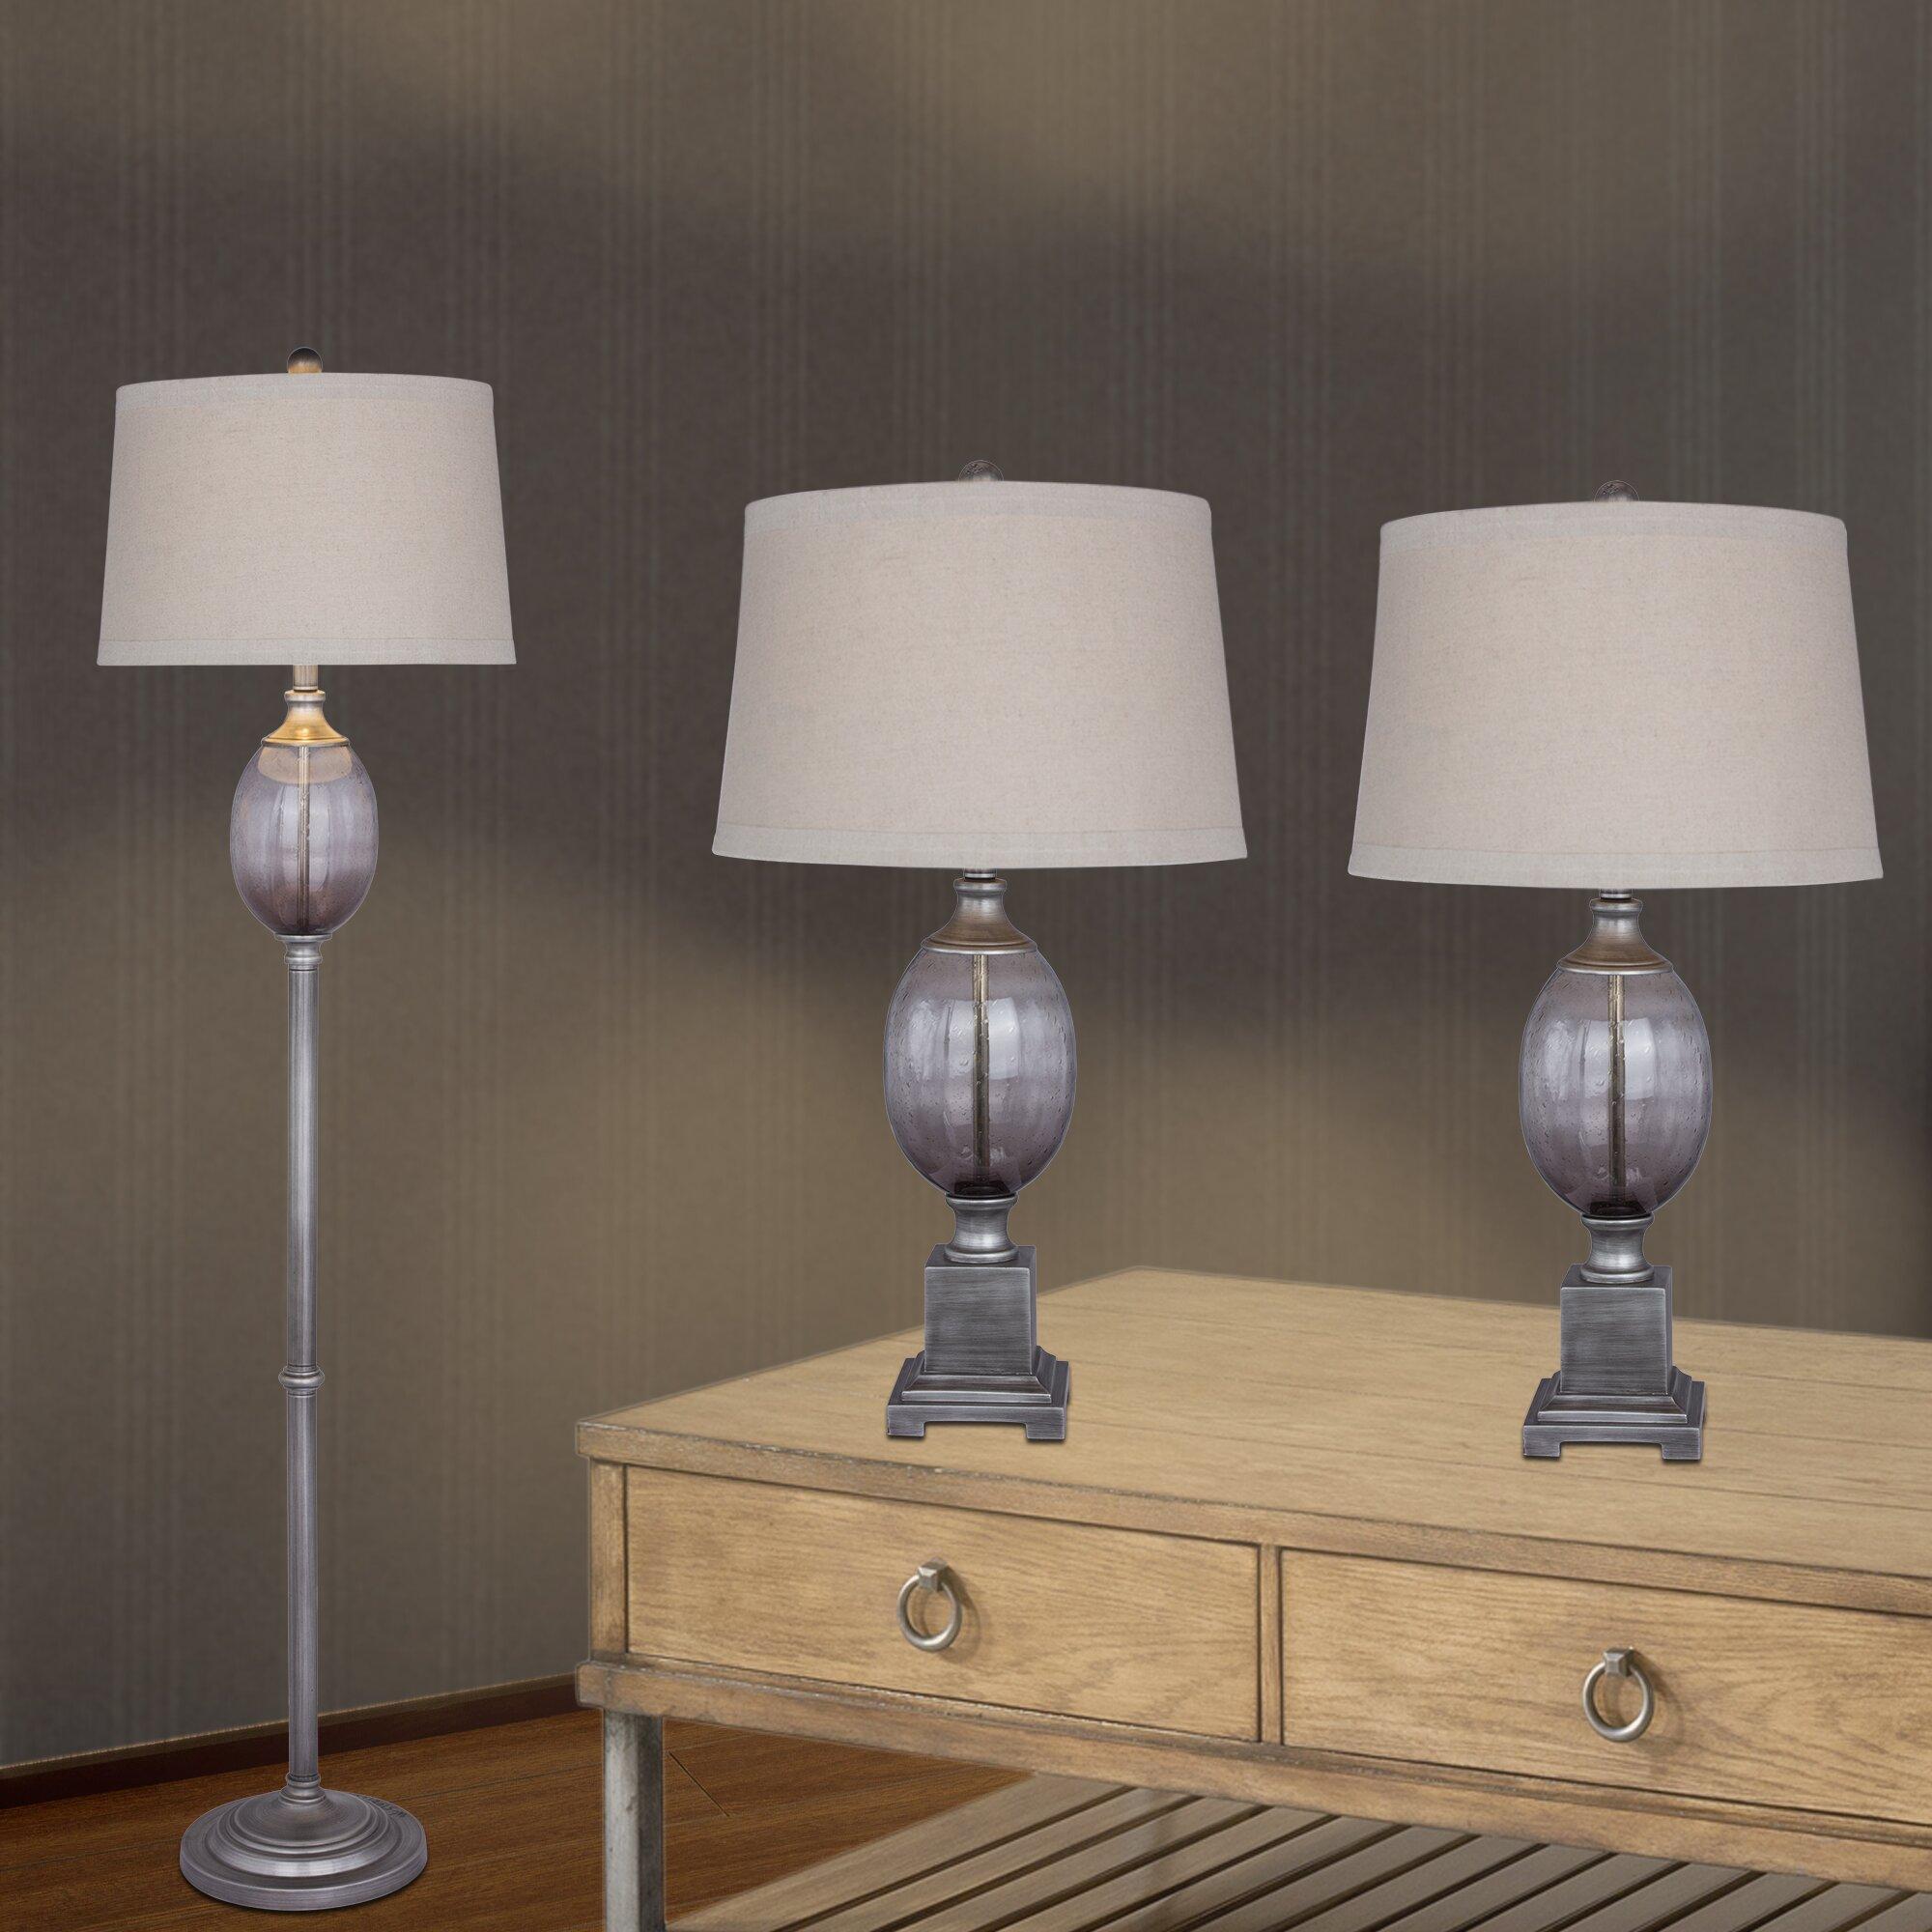 lighting lamps table lamps fangio sku fg2130. Black Bedroom Furniture Sets. Home Design Ideas